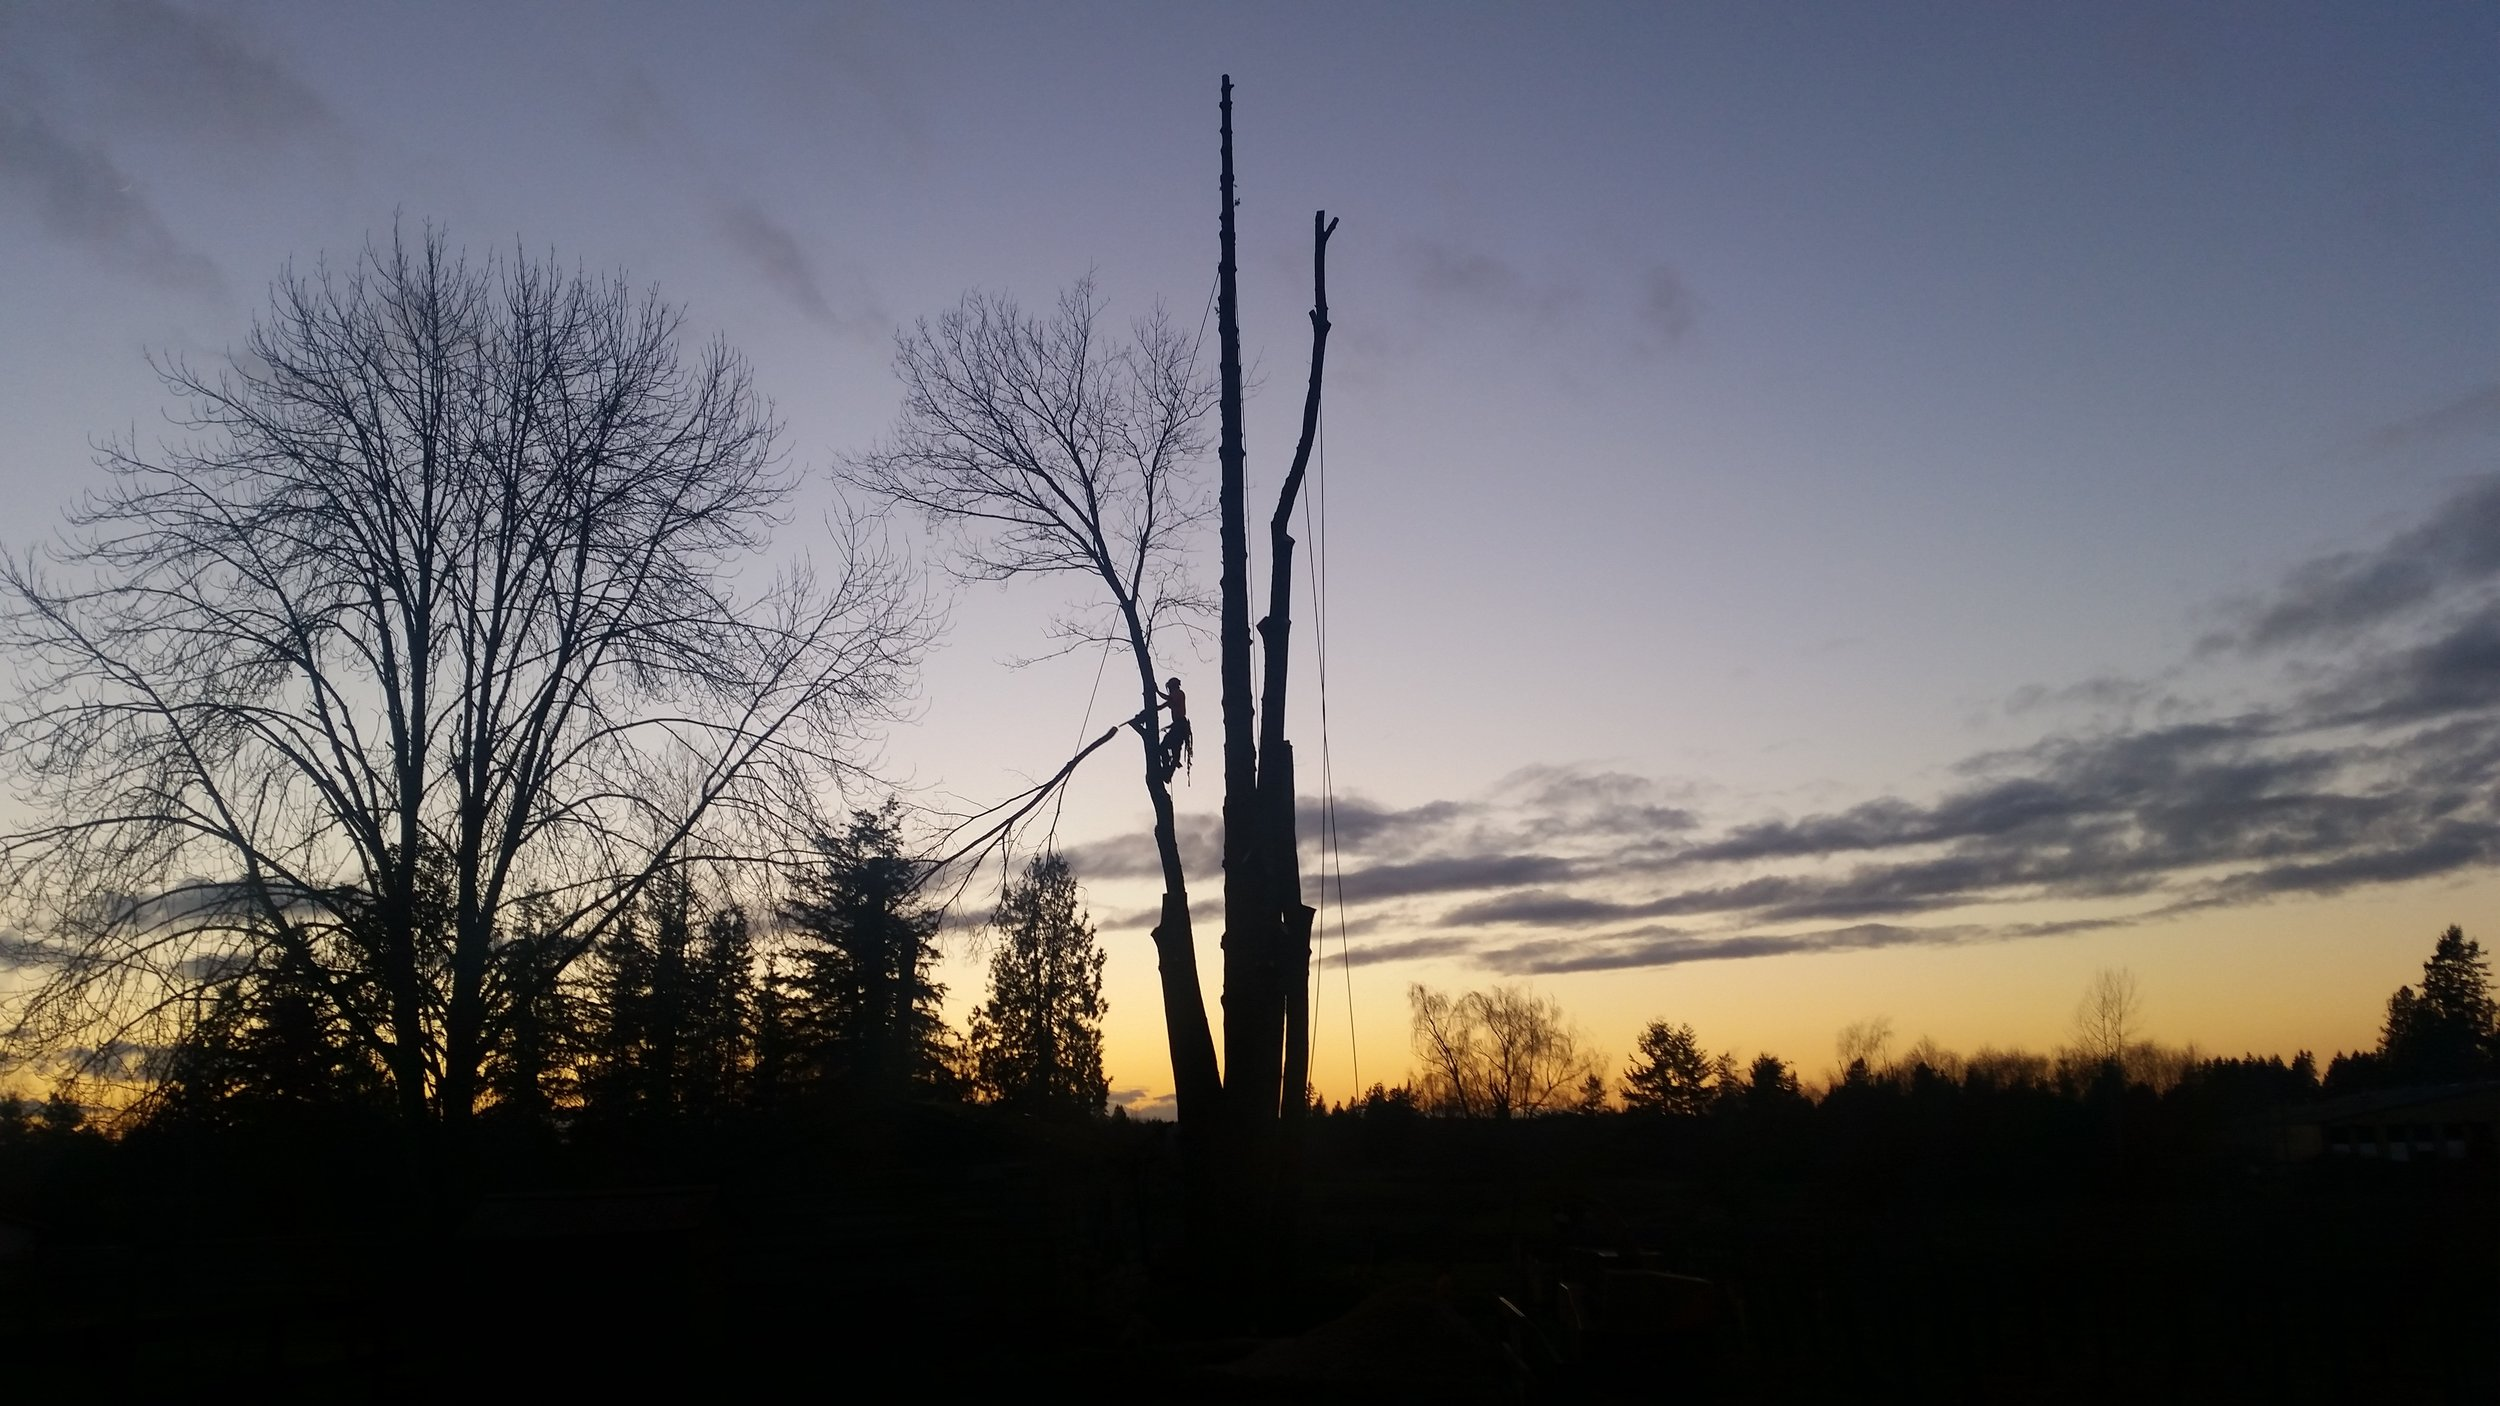 sunset limb.jpg